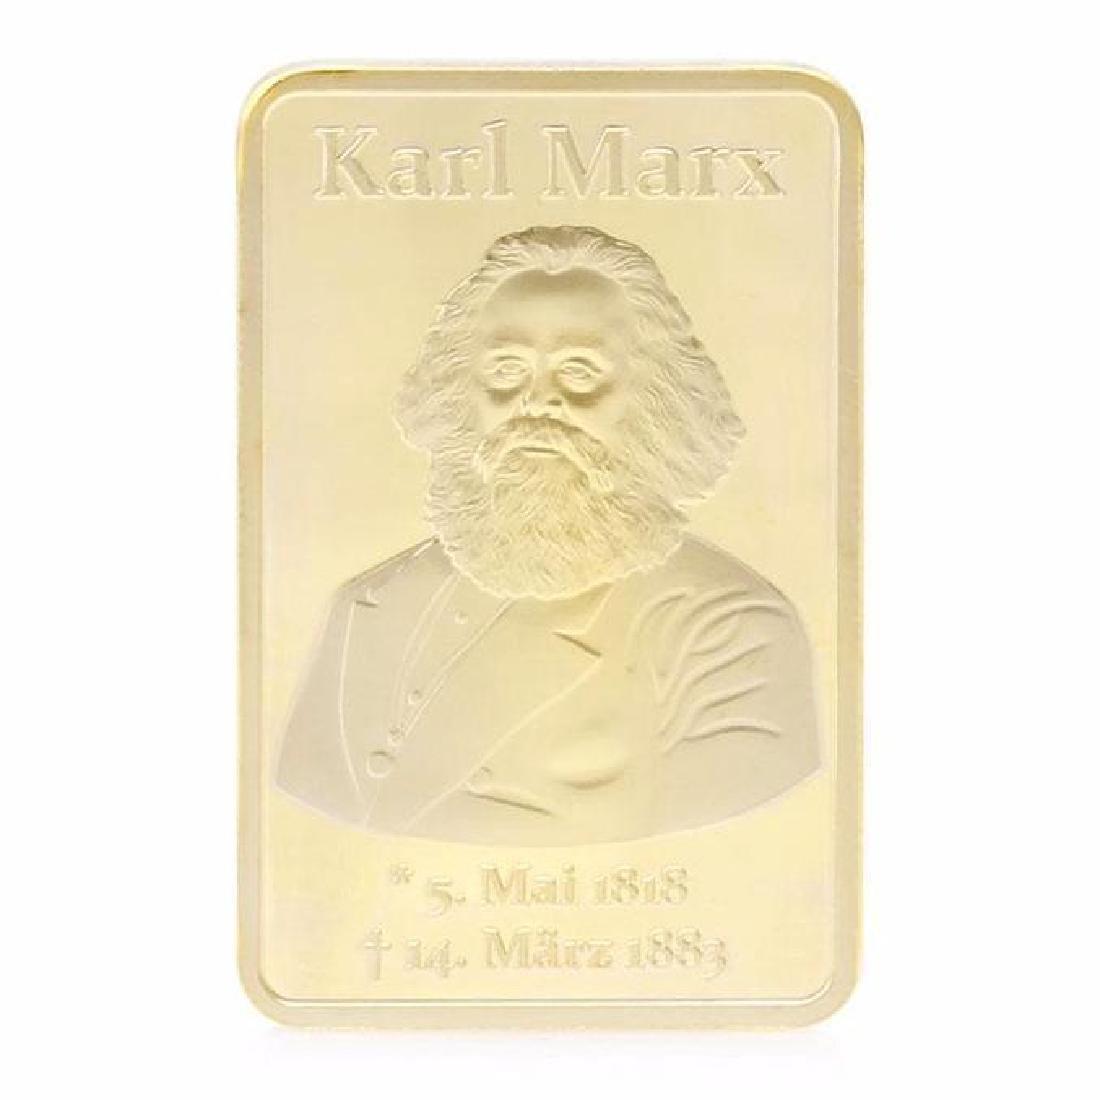 Karl Marx 999/1000 Gold Clad Bullion Bar